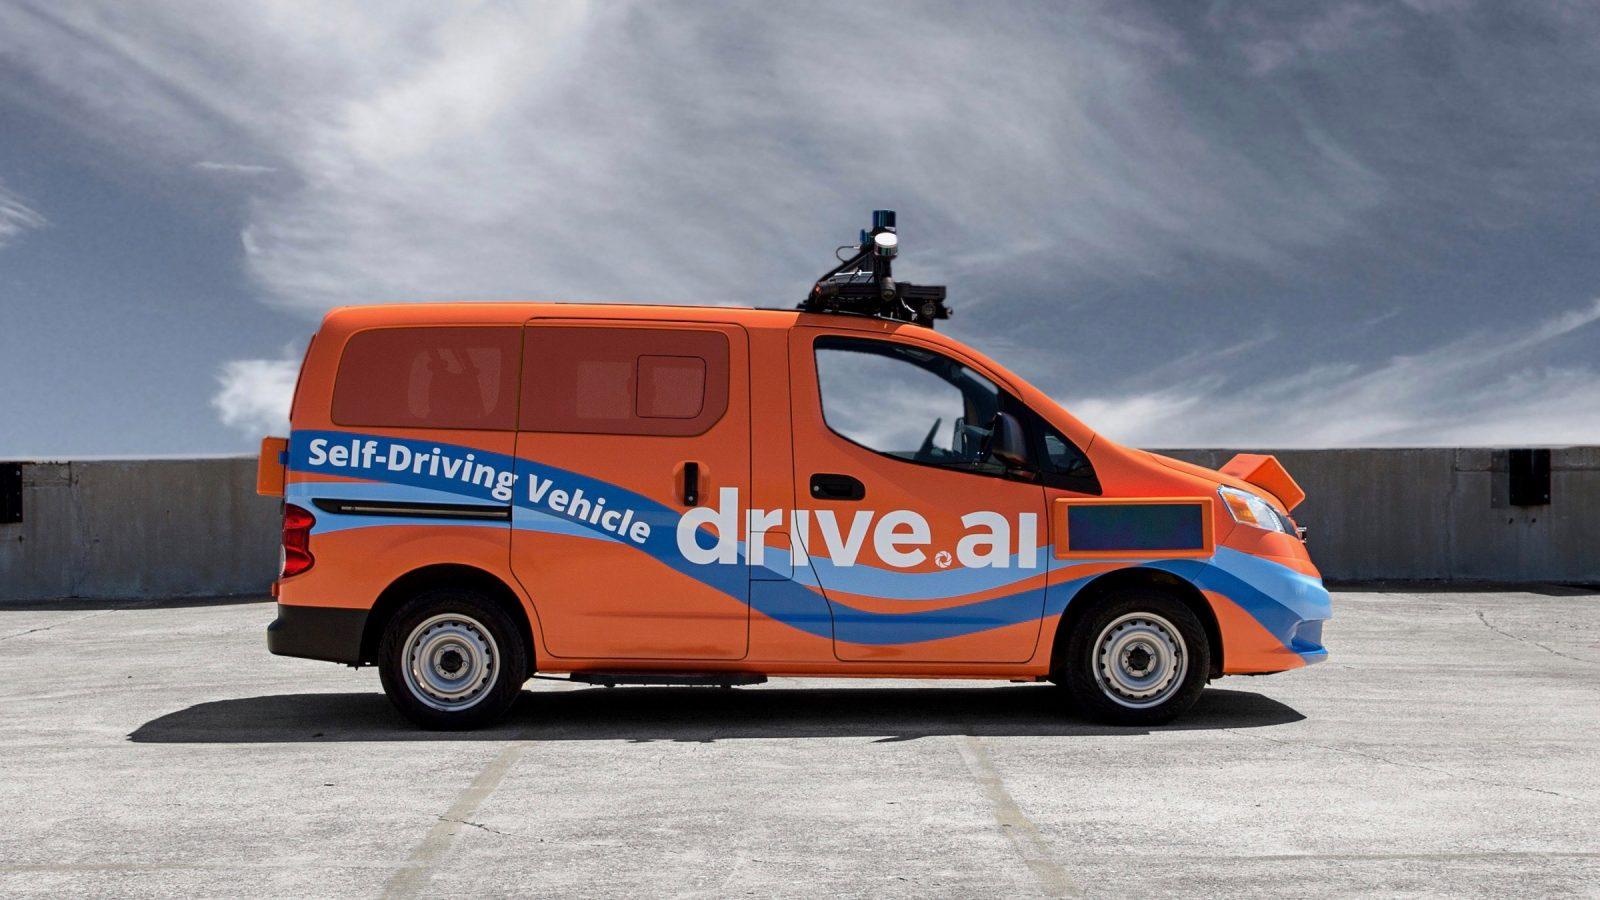 Apple compra startup de conducción autónoma llamada Drive.ai